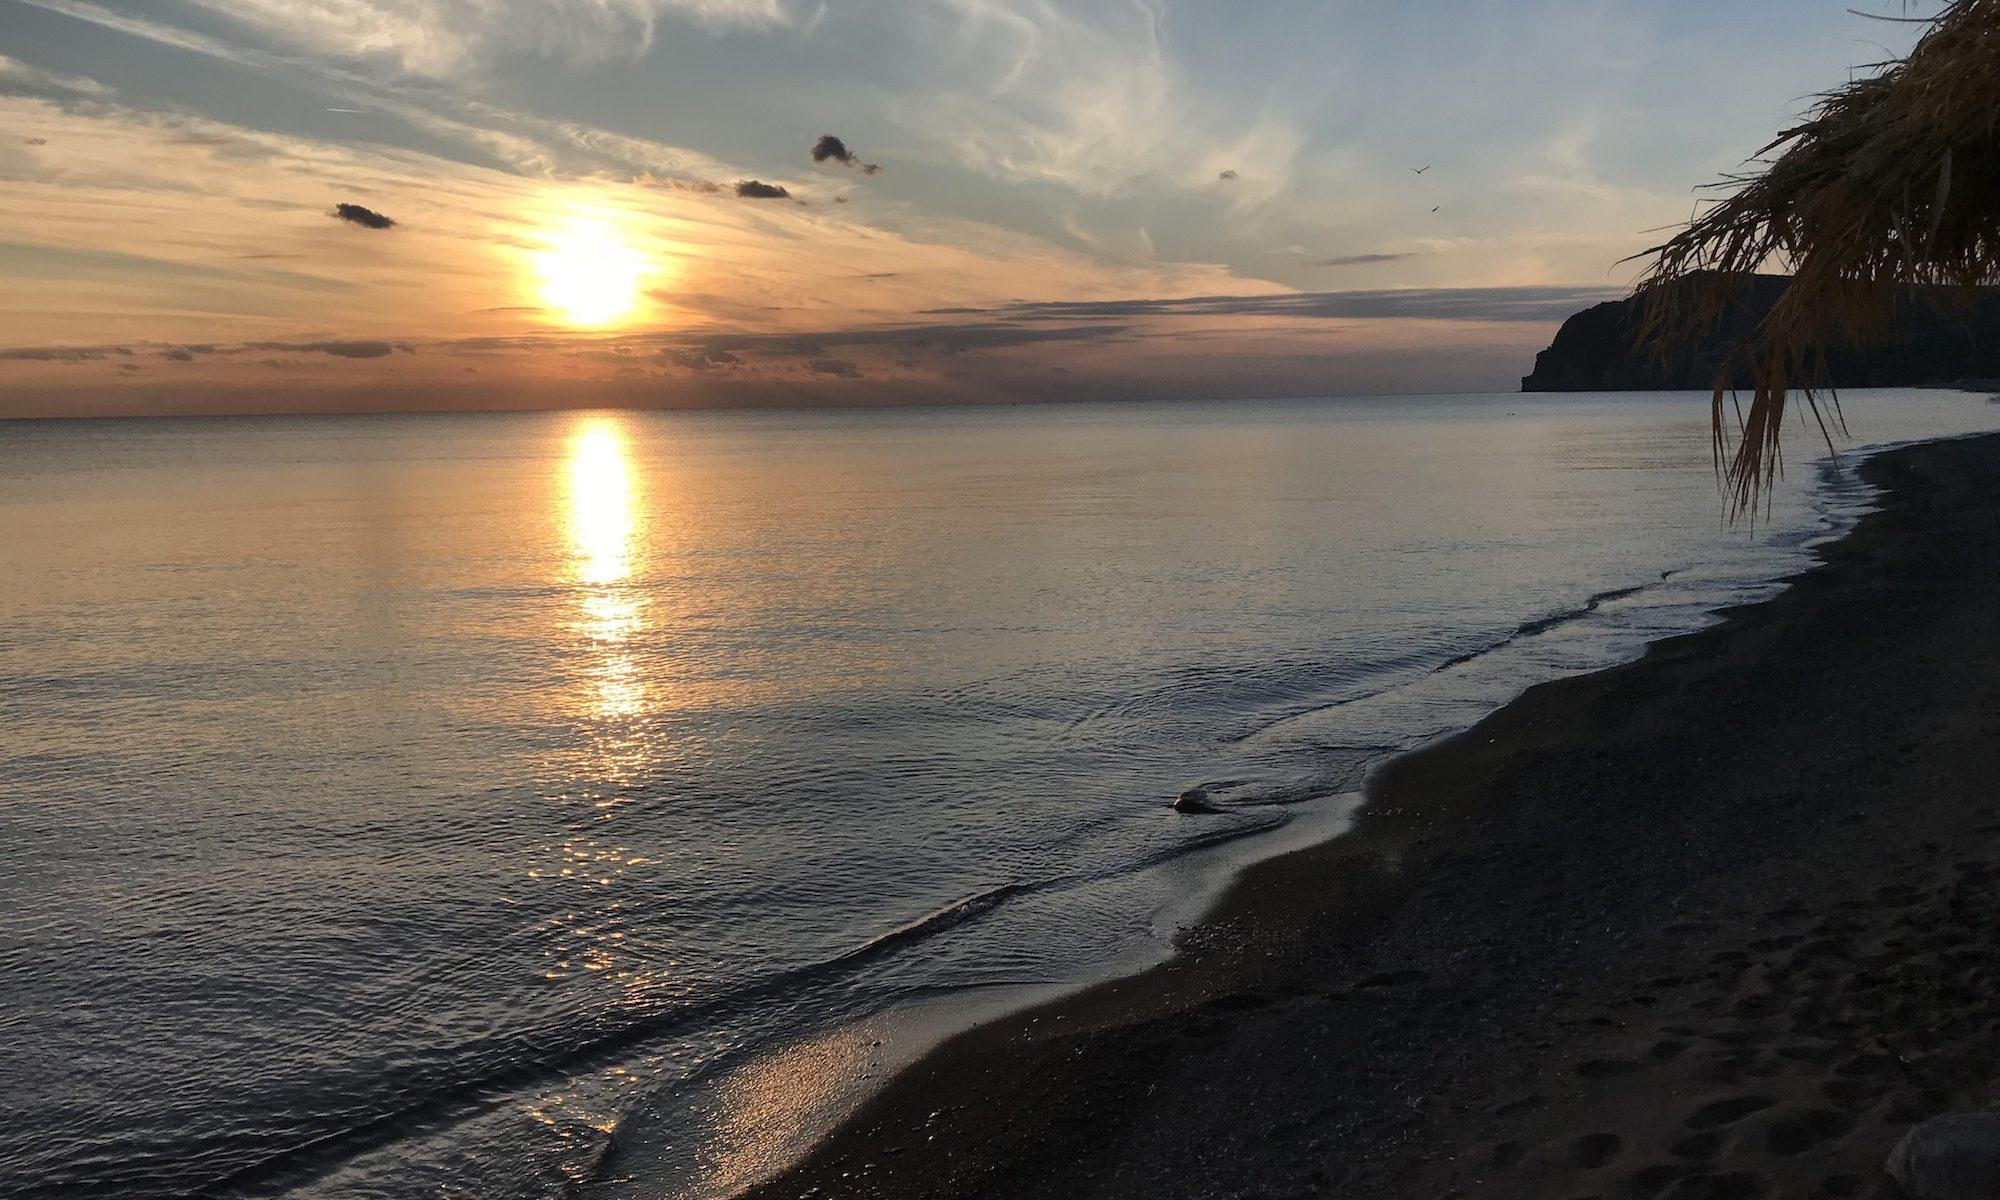 Sonnenuntergang Eressos